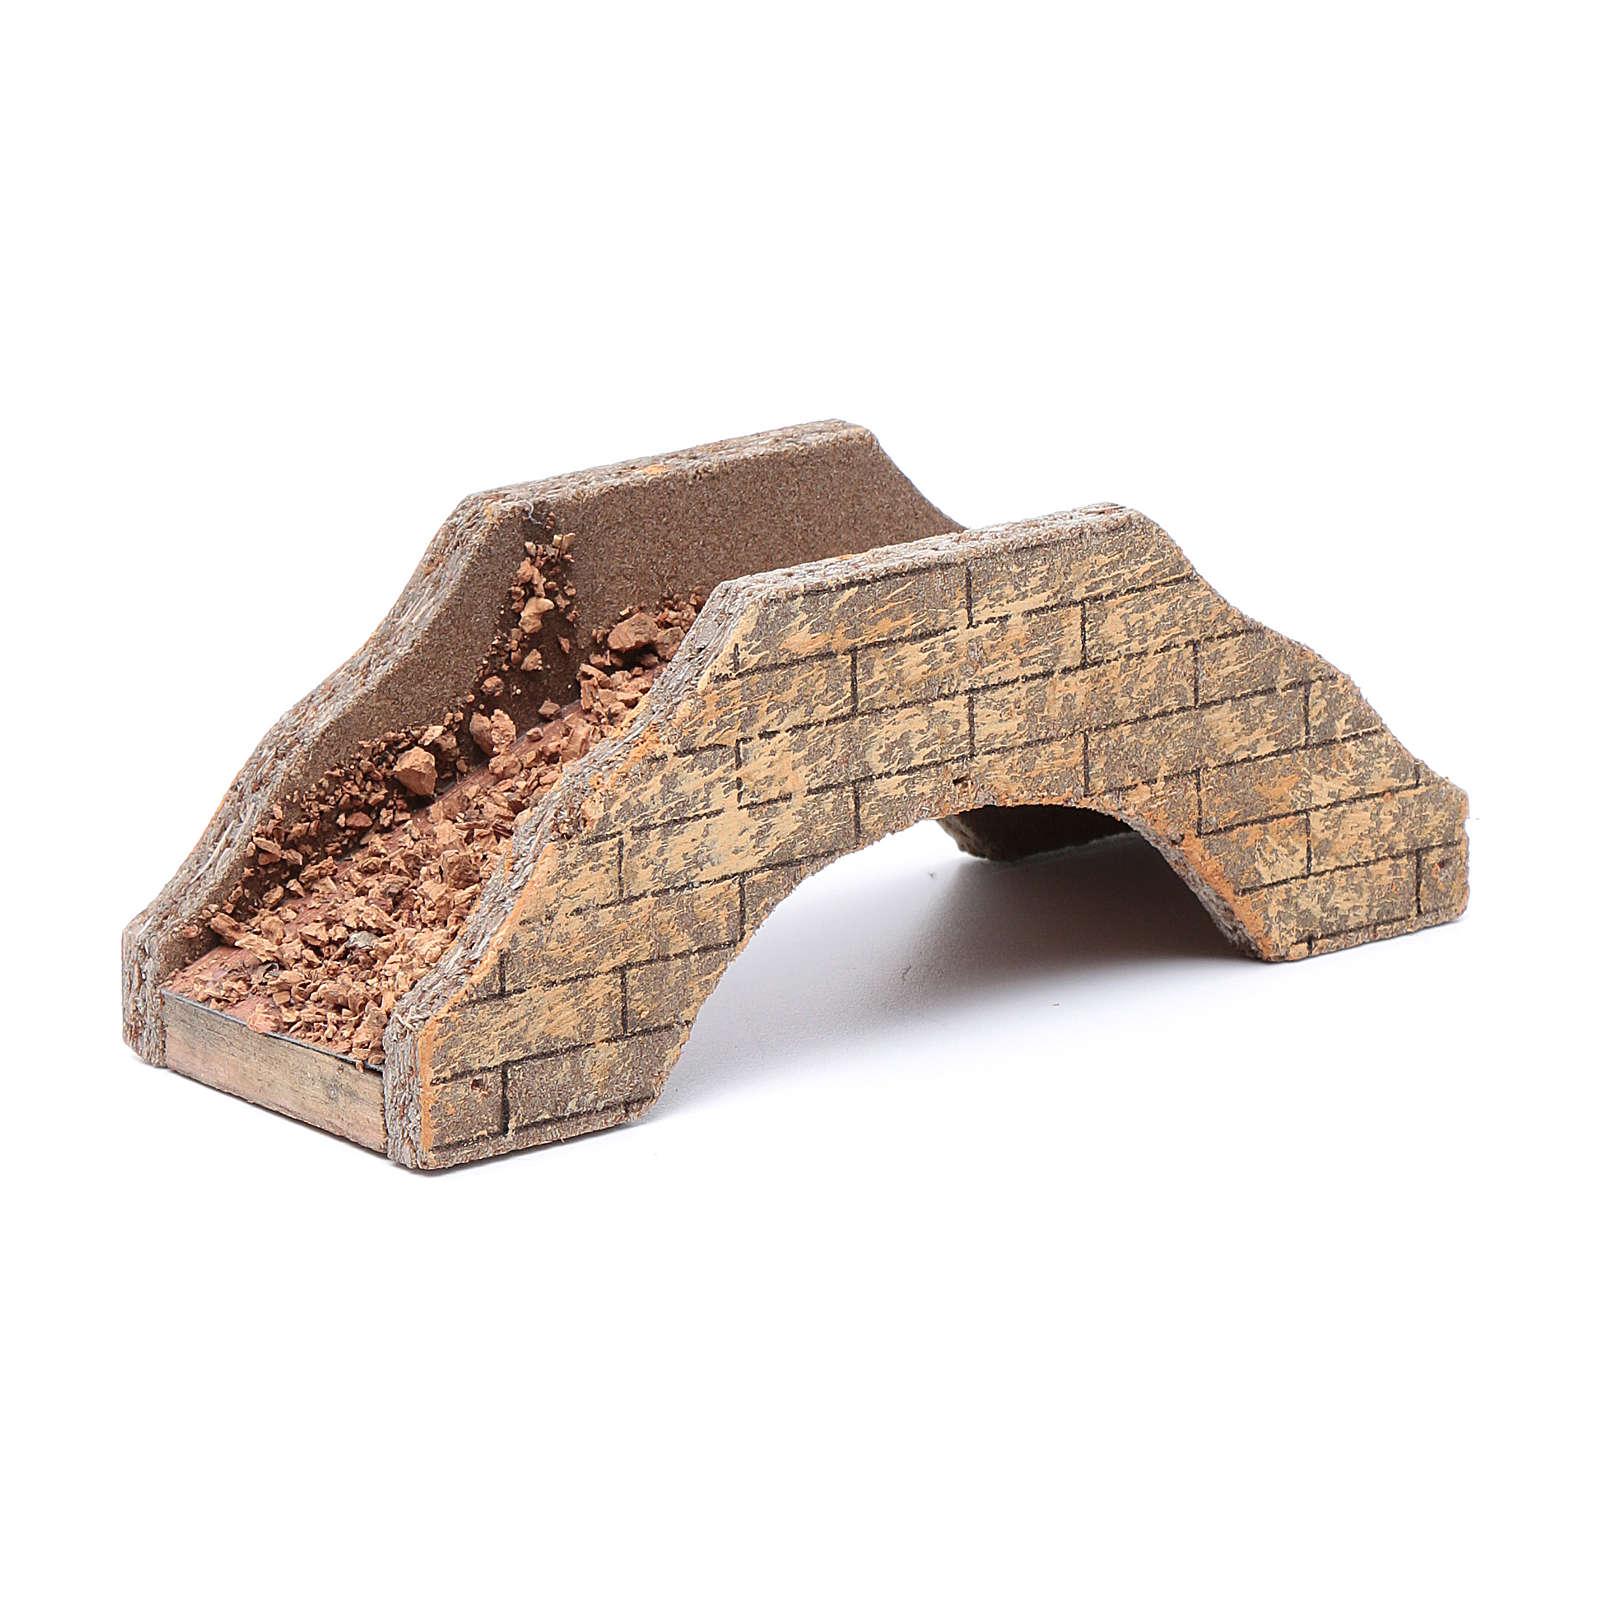 Ponte per presepe in legno 5x15x6 cm 4